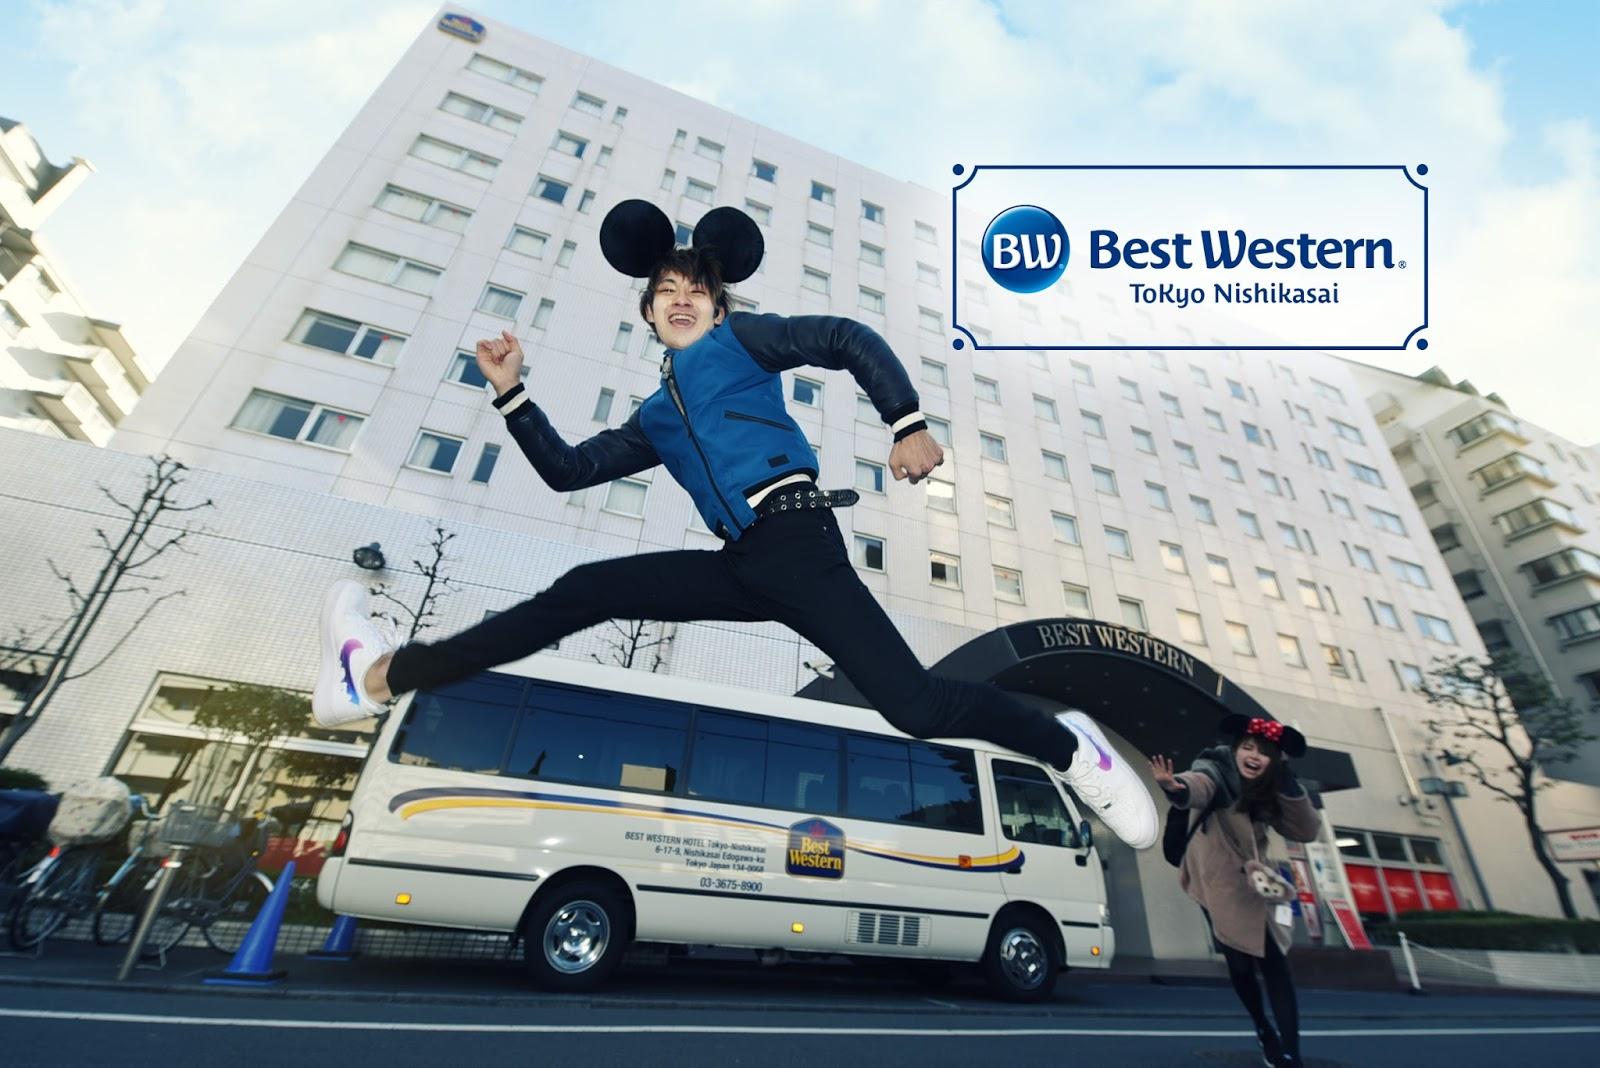 Grande nishikasai western best tokyo